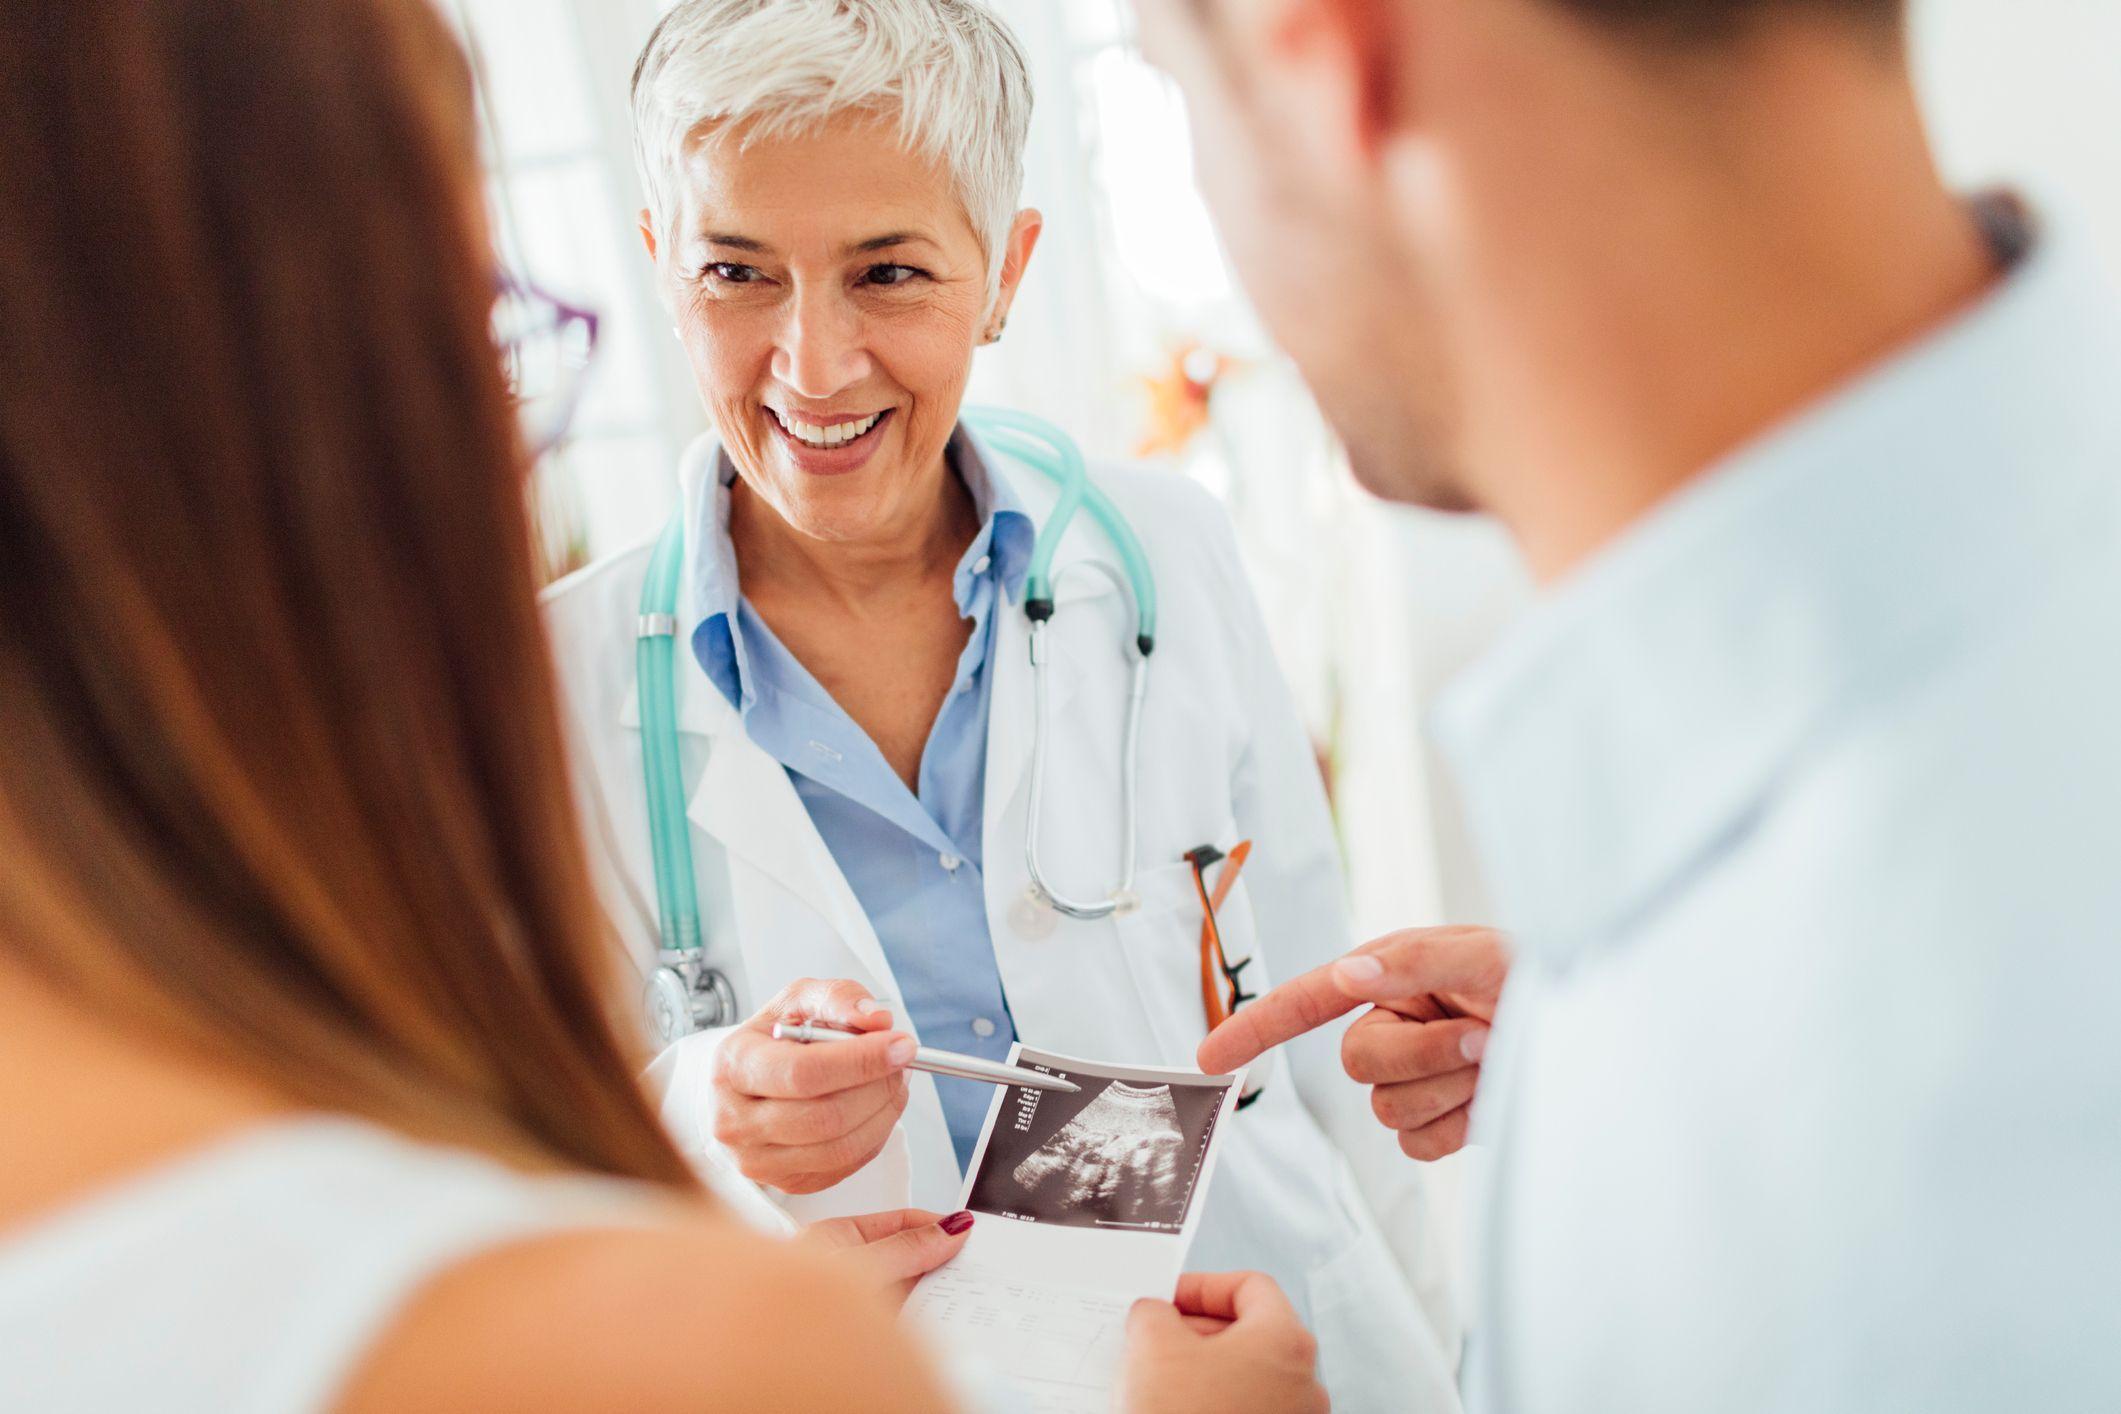 datation FIV grossesse infertilité Halo 3 Matchmaking